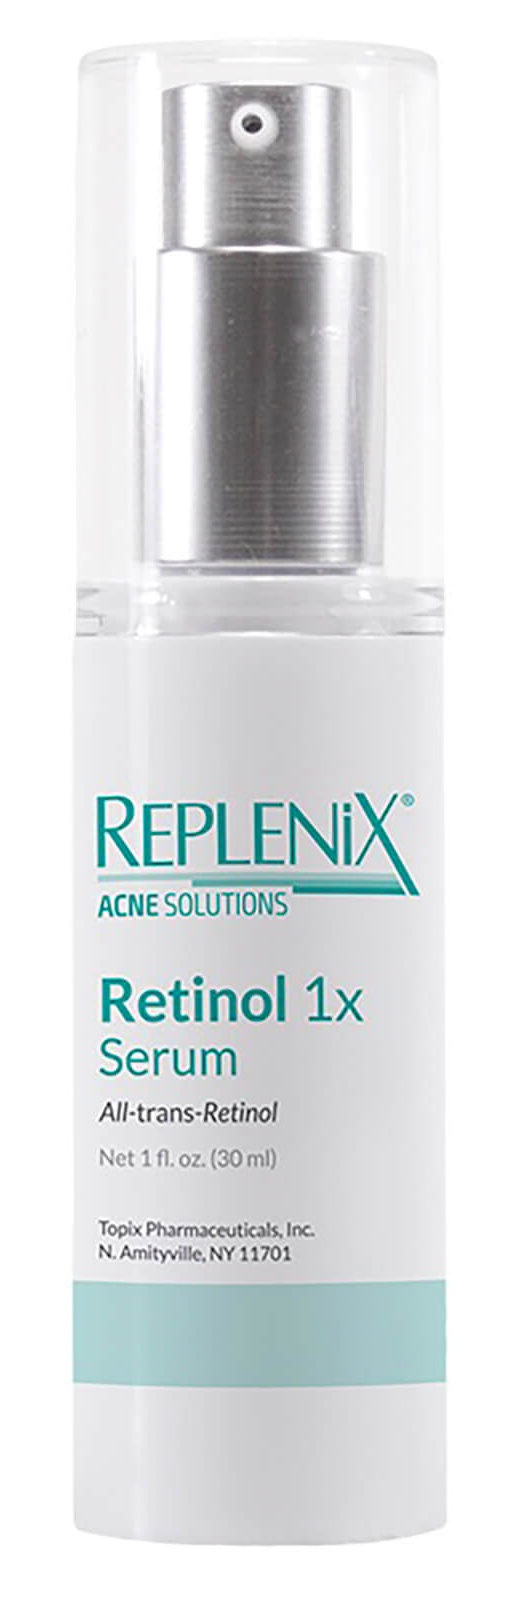 Topix Replenix Acne Solutions Retinol Serum 1X